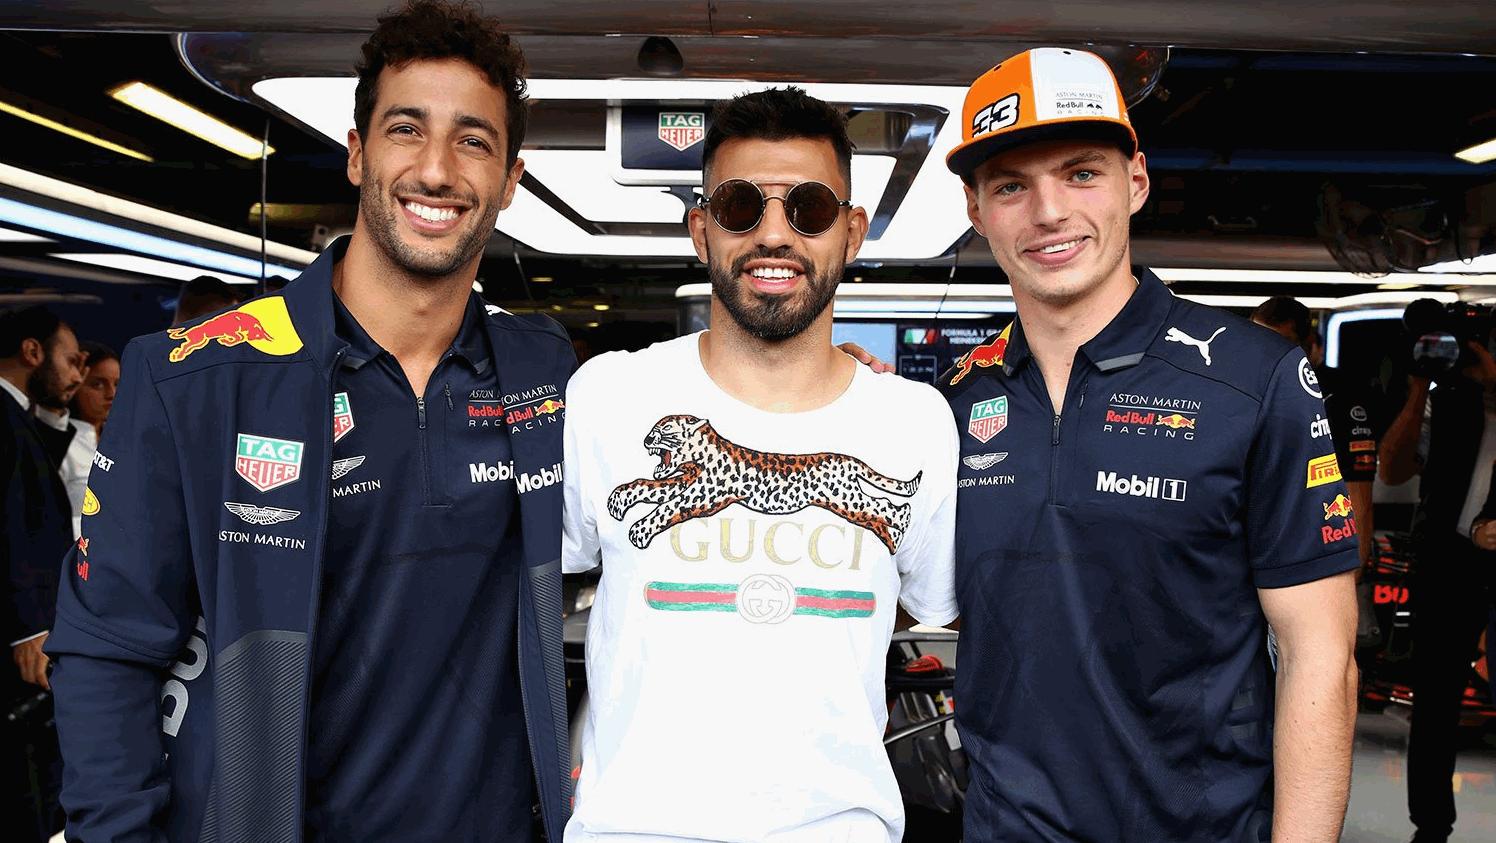 F1, quanti vip a Monza!